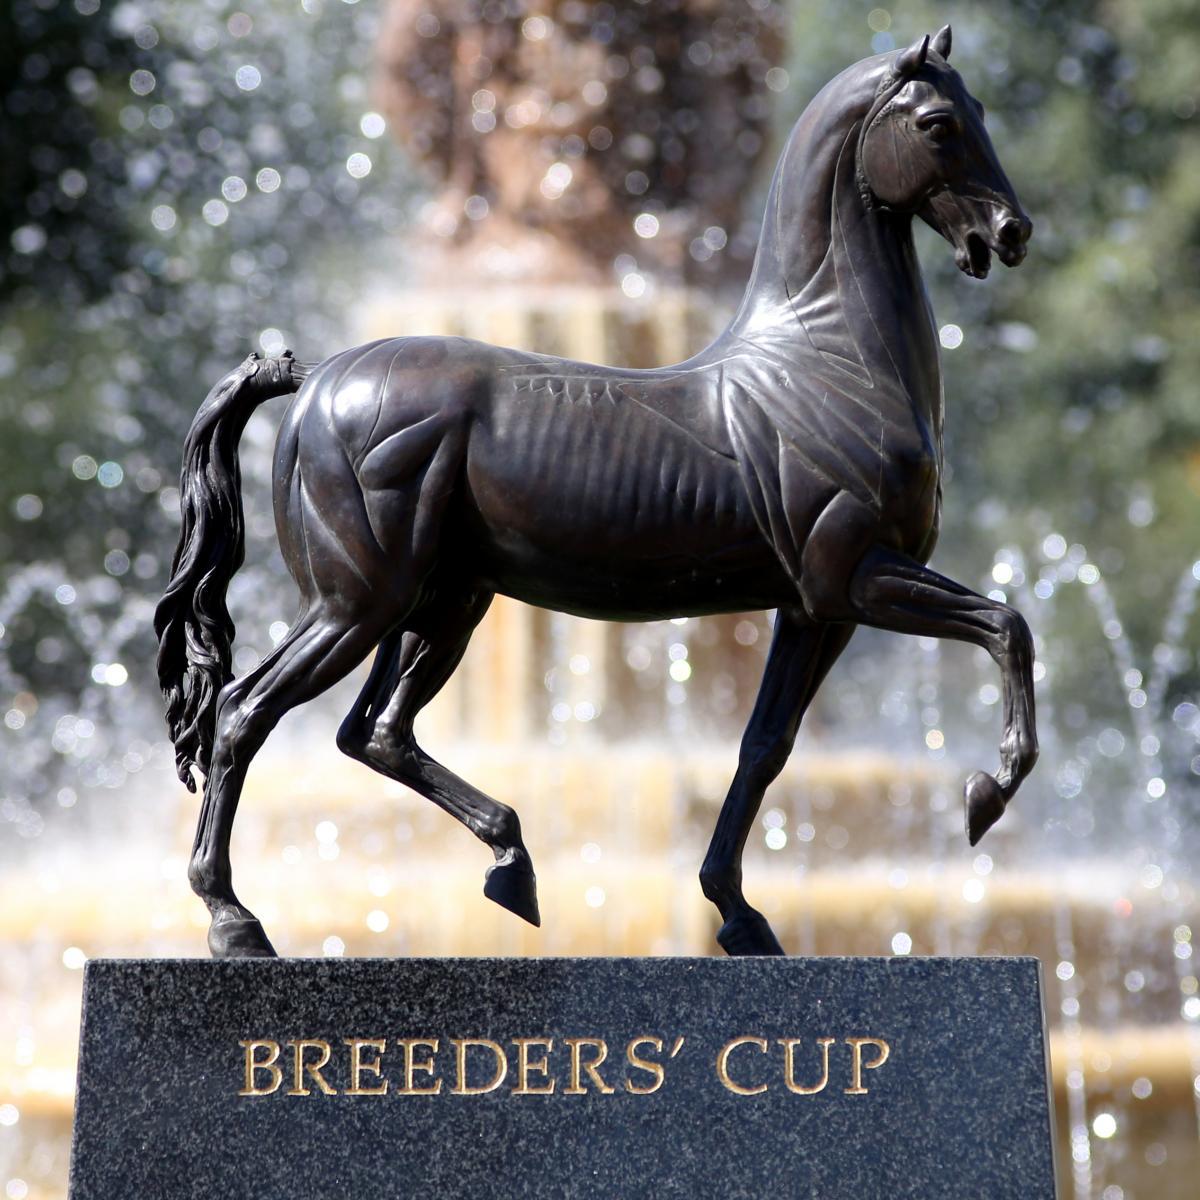 Breeders Cup 2019 Tv Schedule Dates Race Times